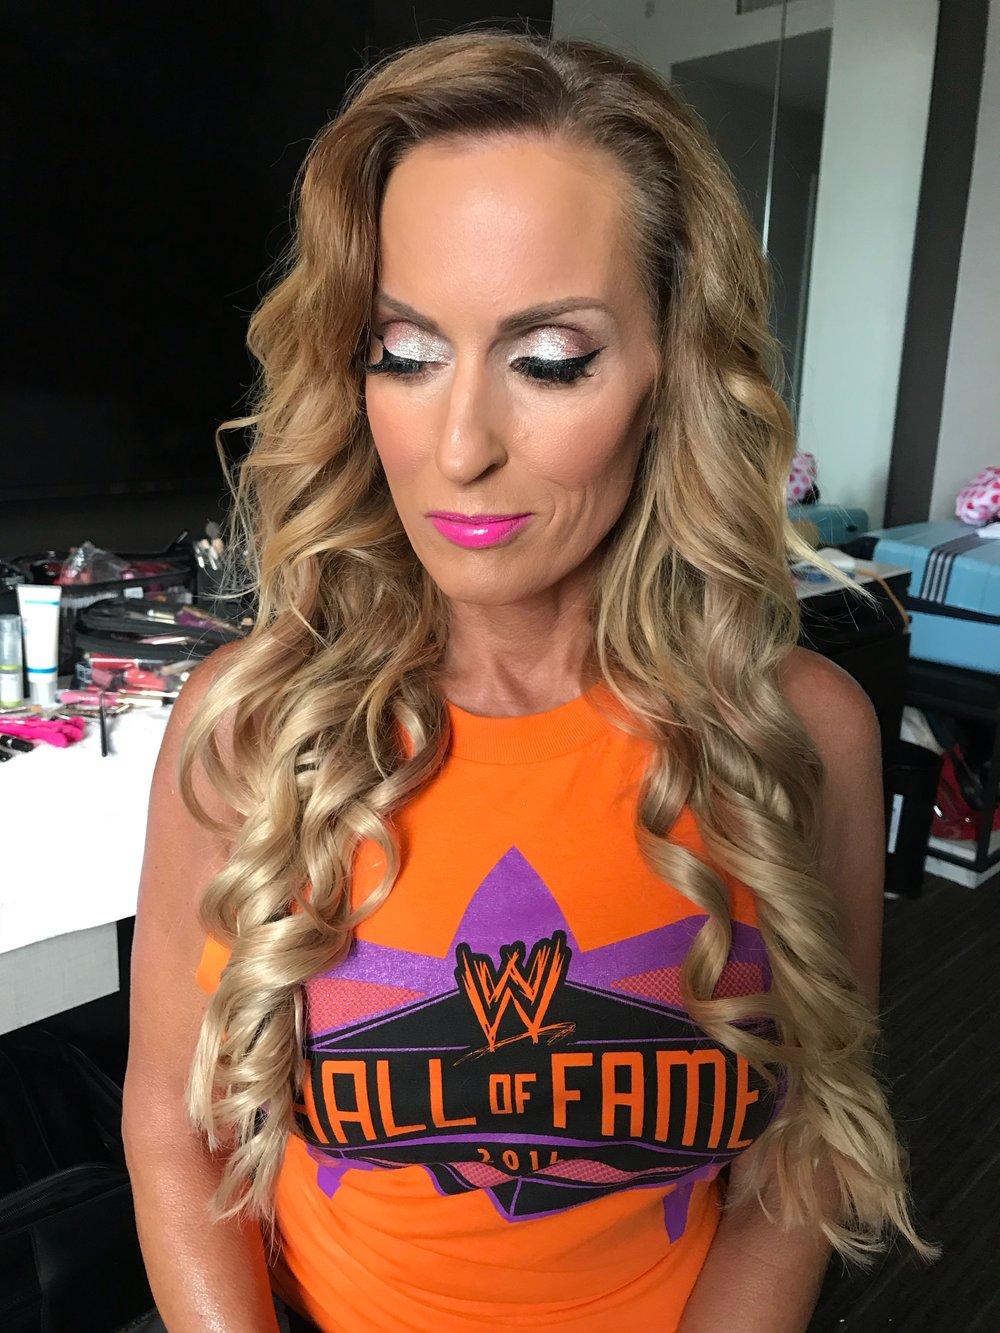 Dana Warrior WWE  (Hair and Makeup)